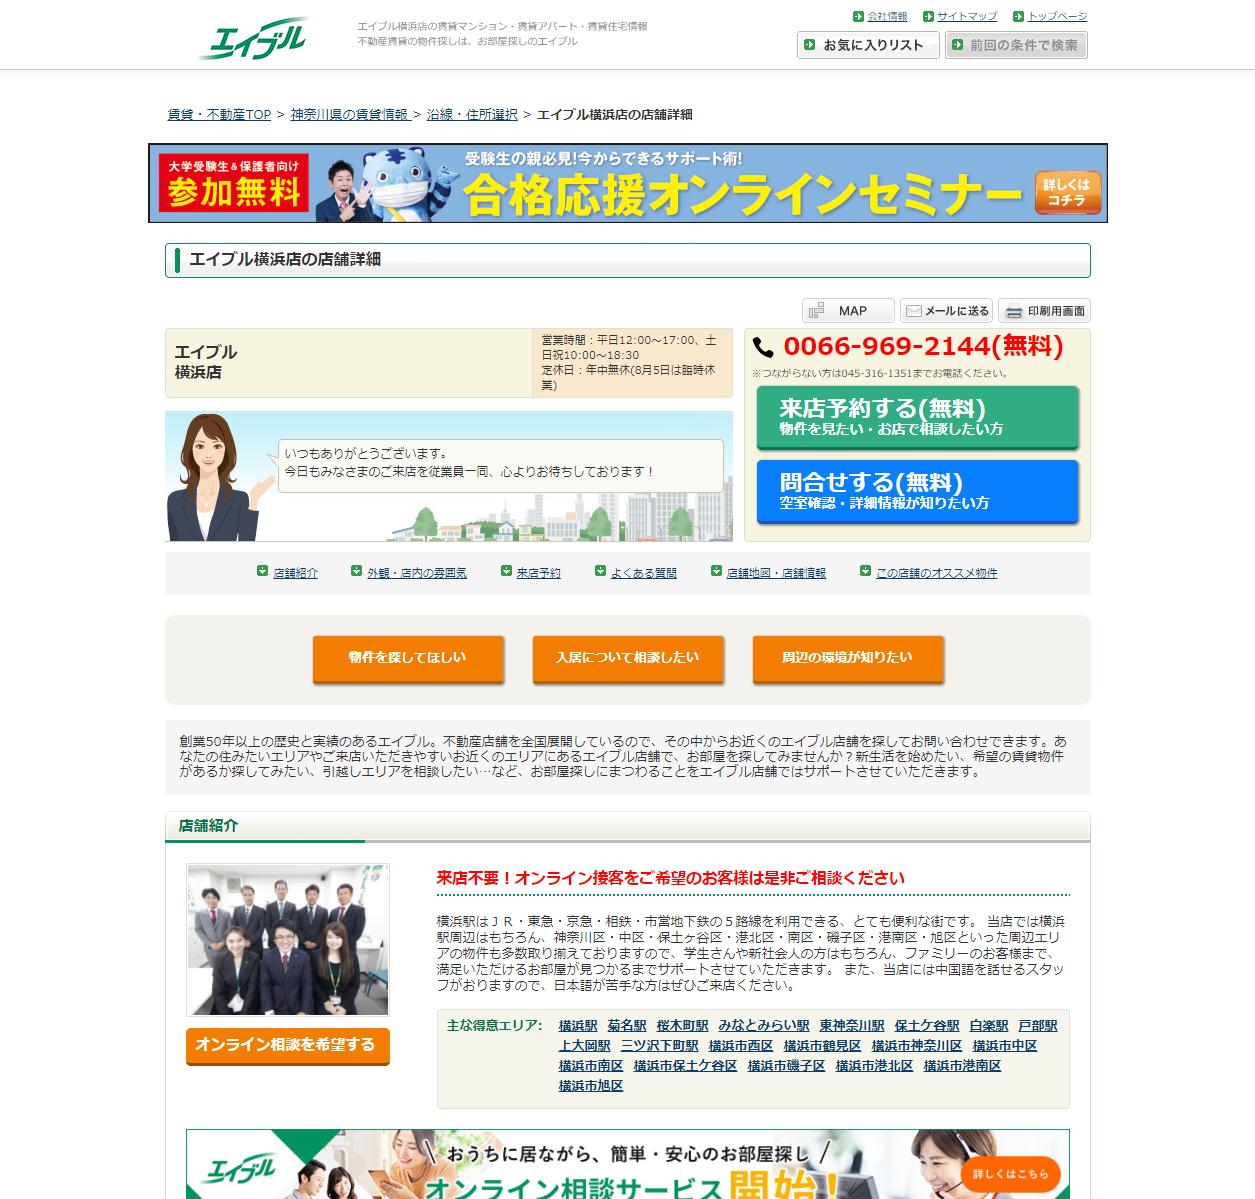 "<span class=""title"">エイブル横浜店の口コミや評判</span>"